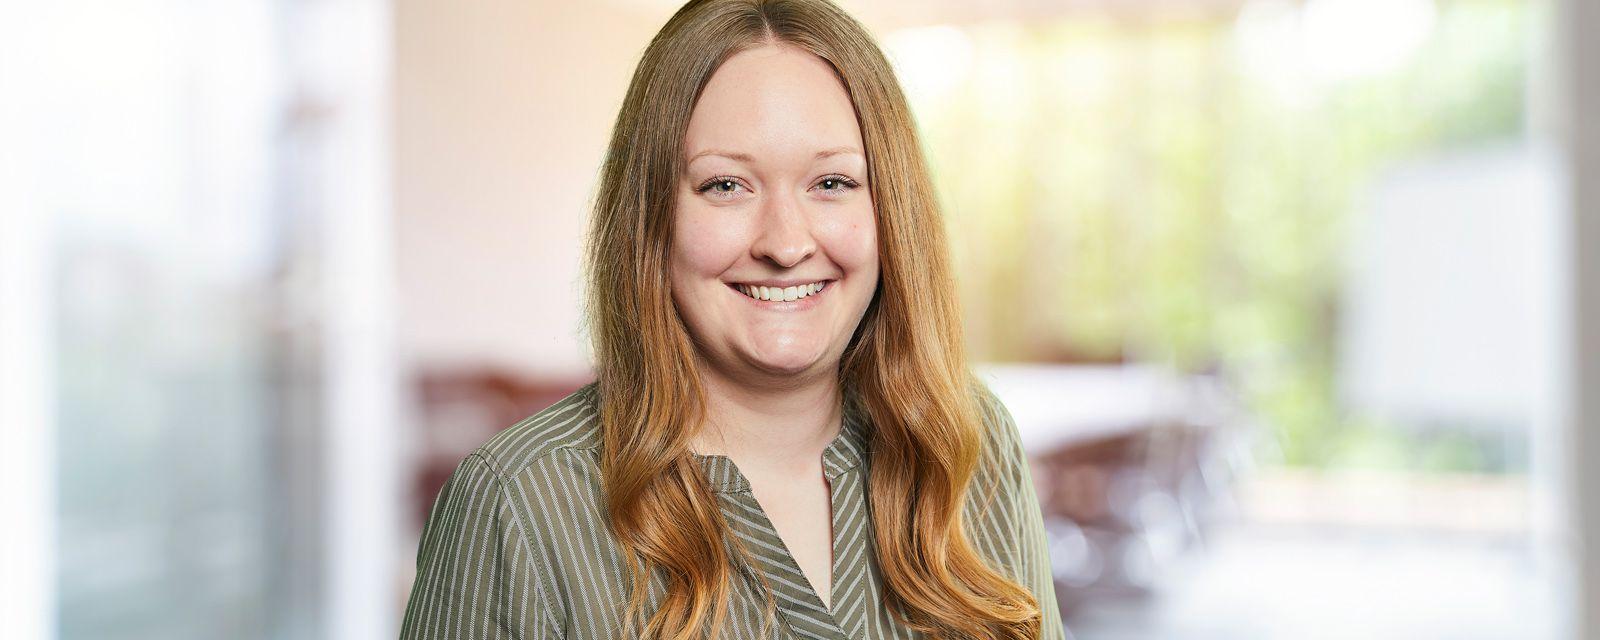 Kerstin Luder (Foto: Michael Schafranek)